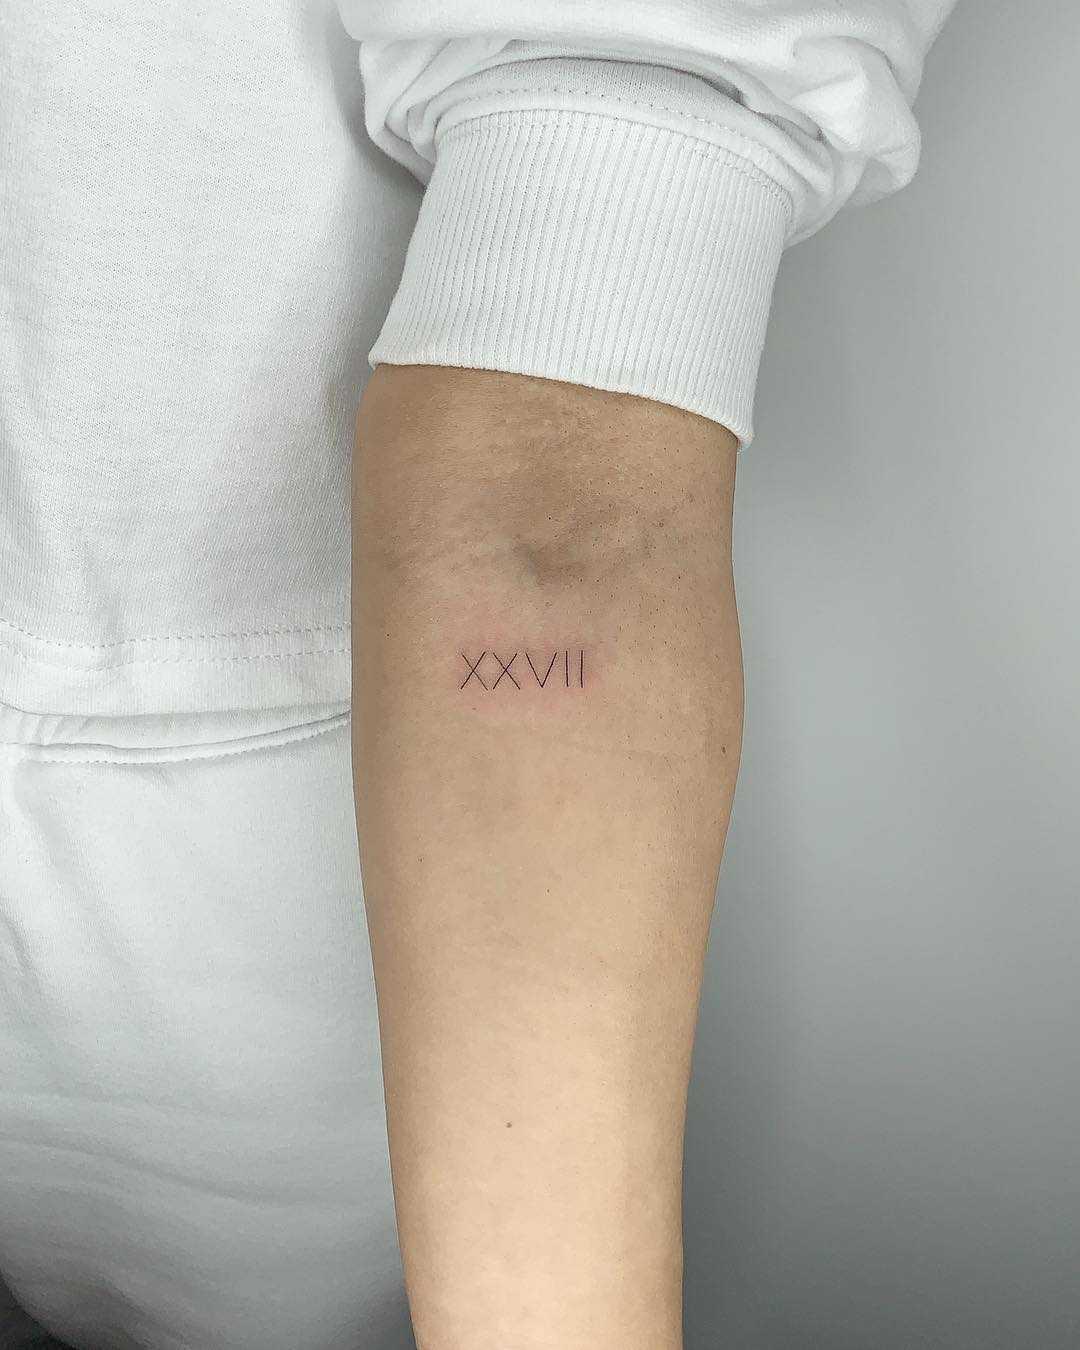 Roman numerals tattoo by Conz Thomas